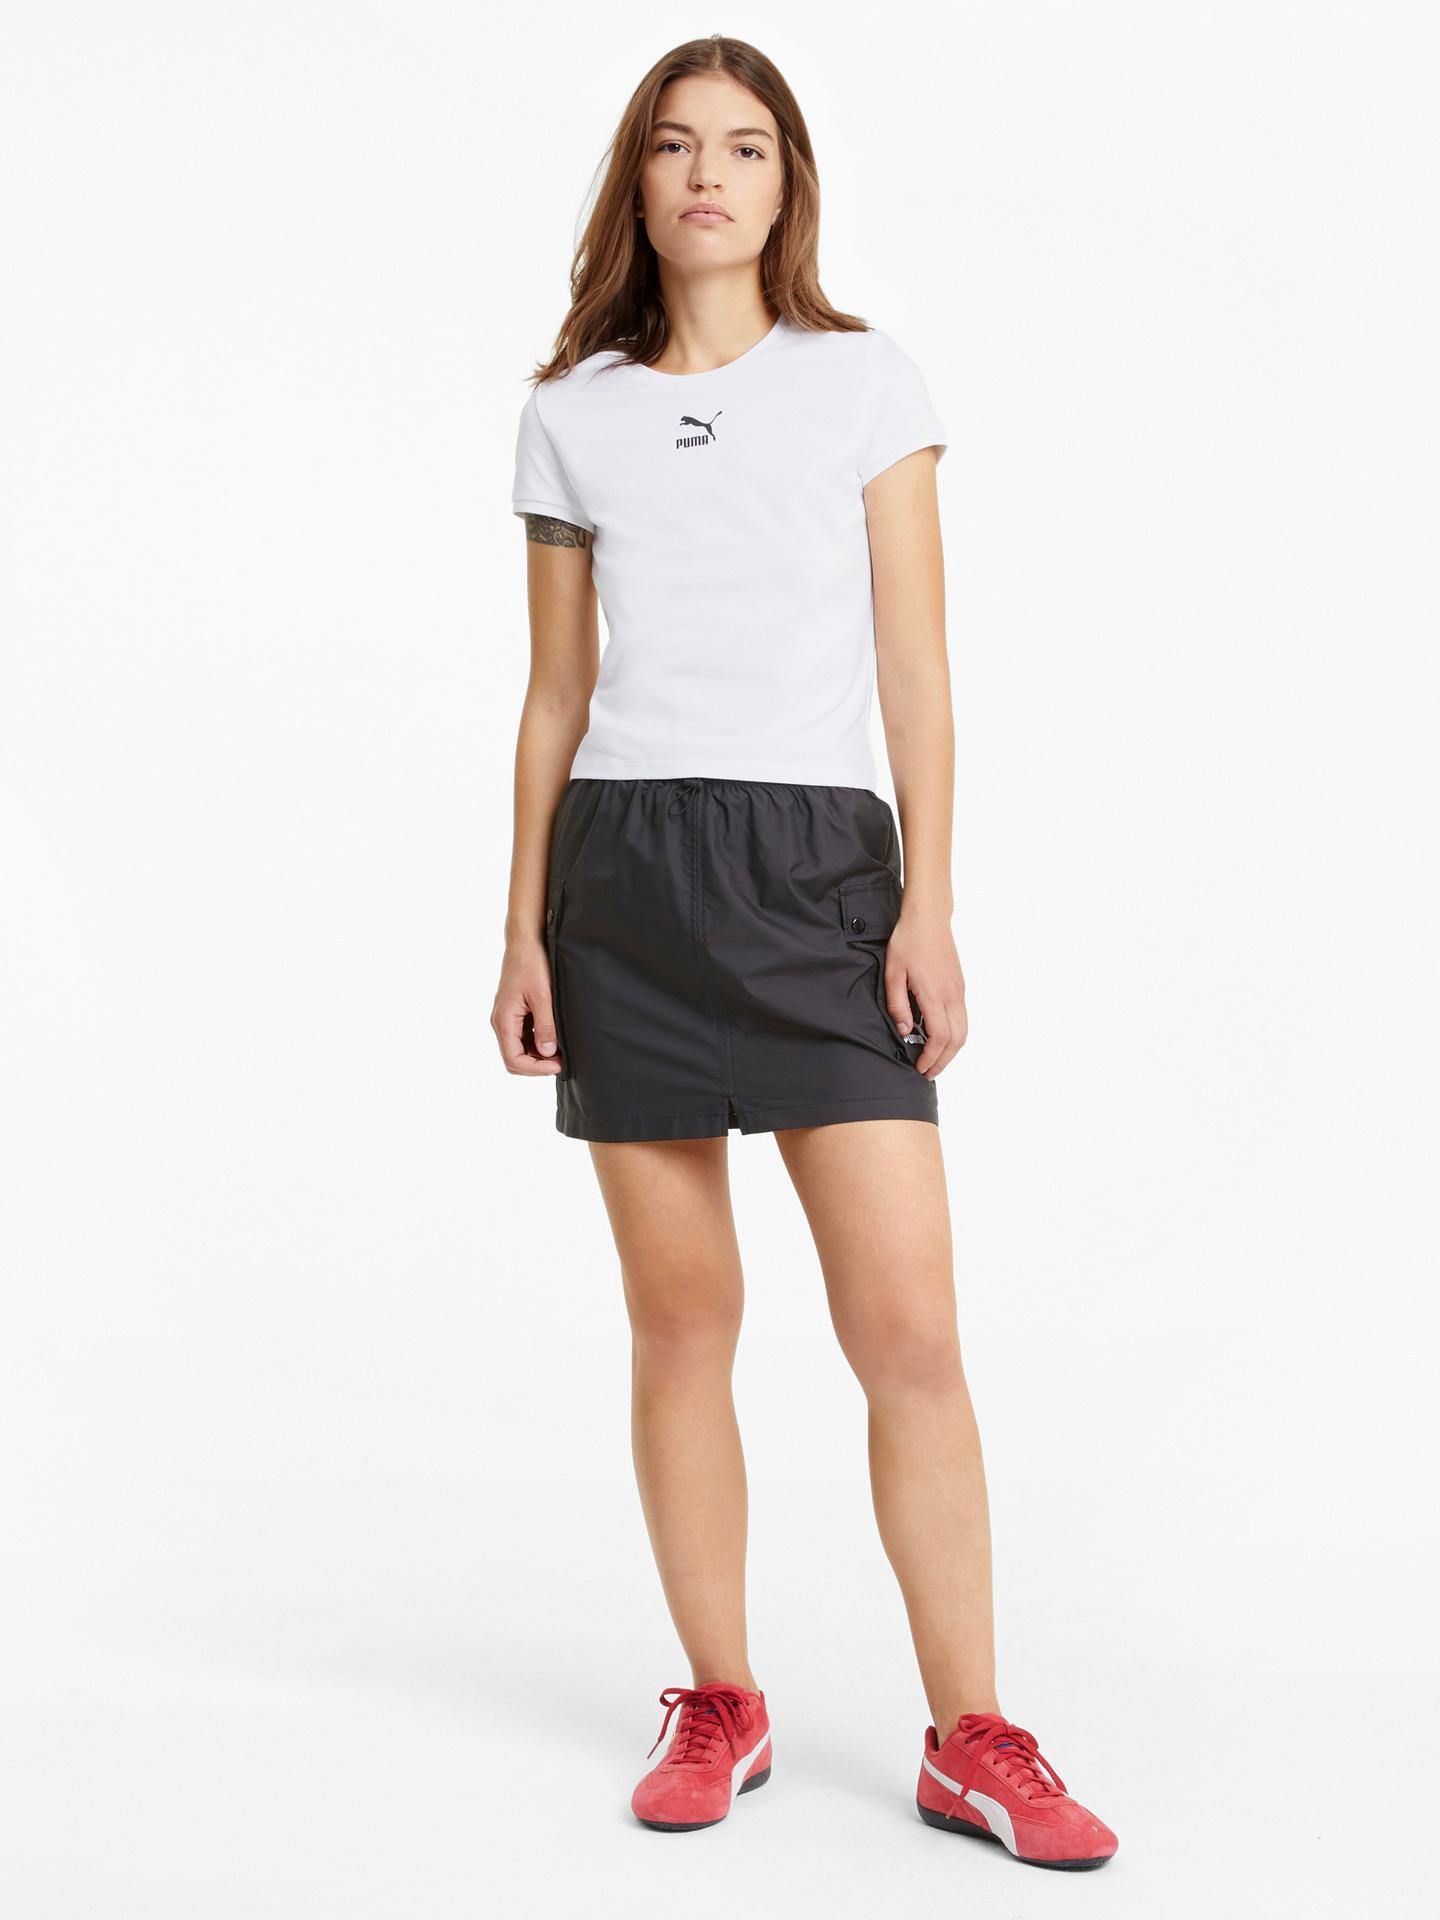 Puma Maglietta donna bianco